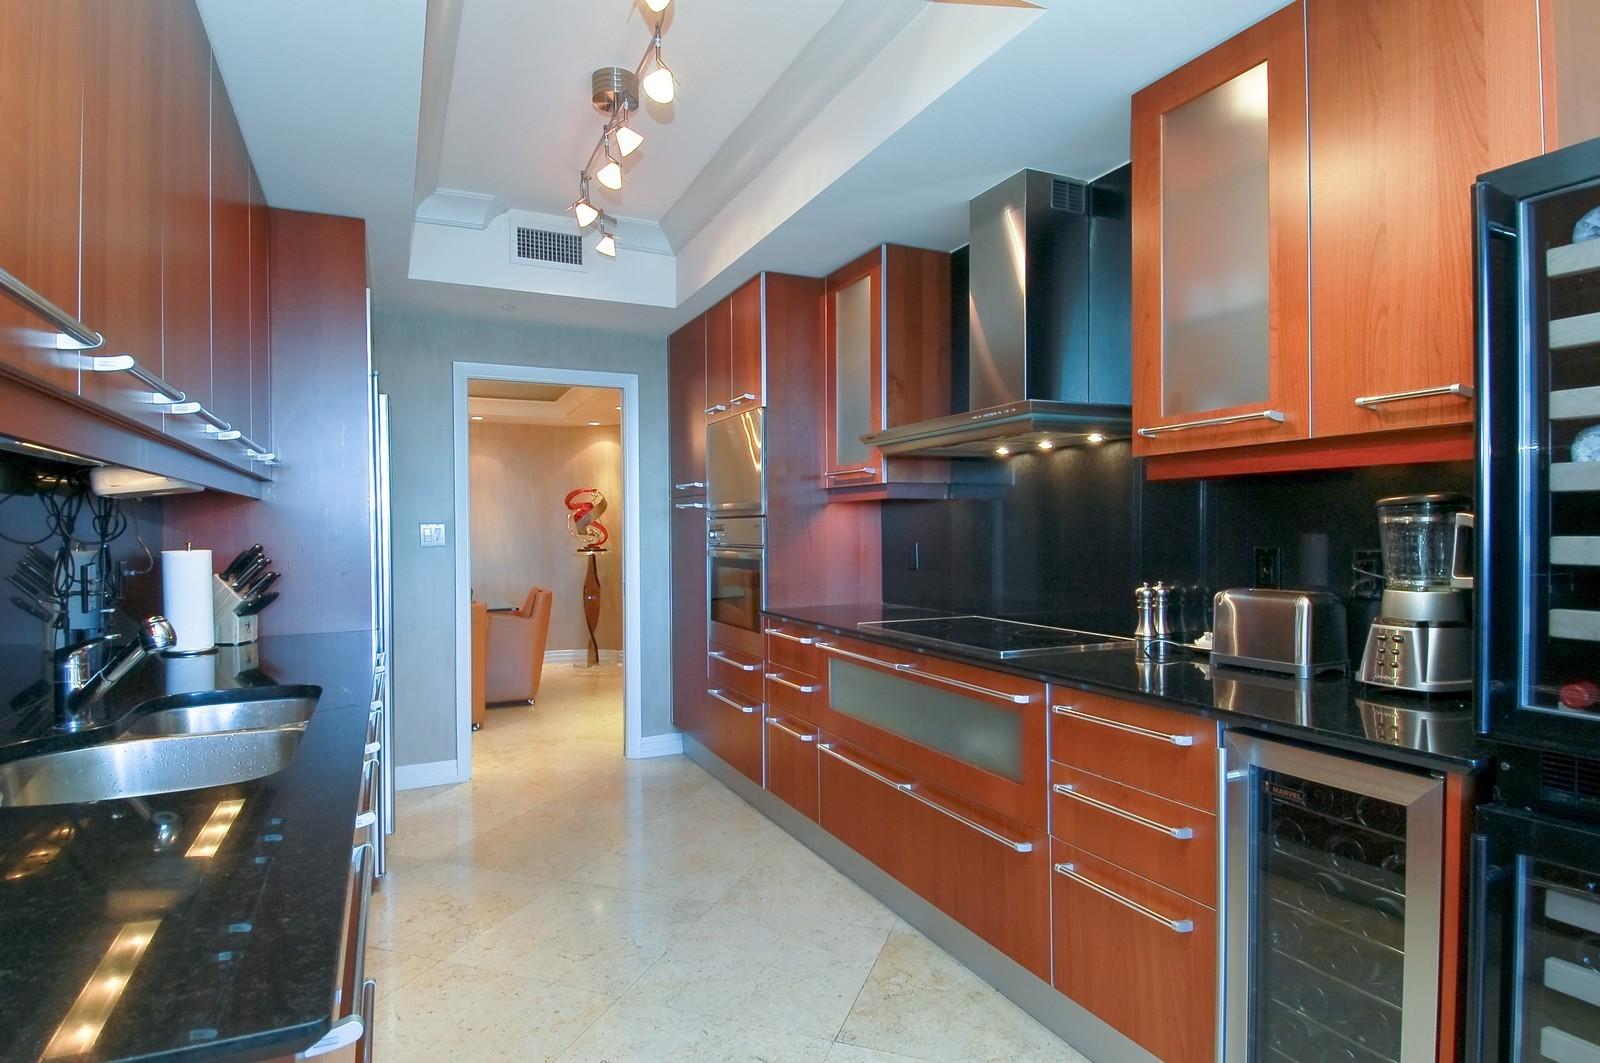 Real Estate Photography - 1600 S Ocean Blvd, Apt 802, Pompano Beach, FL, 33062 - Kitchen